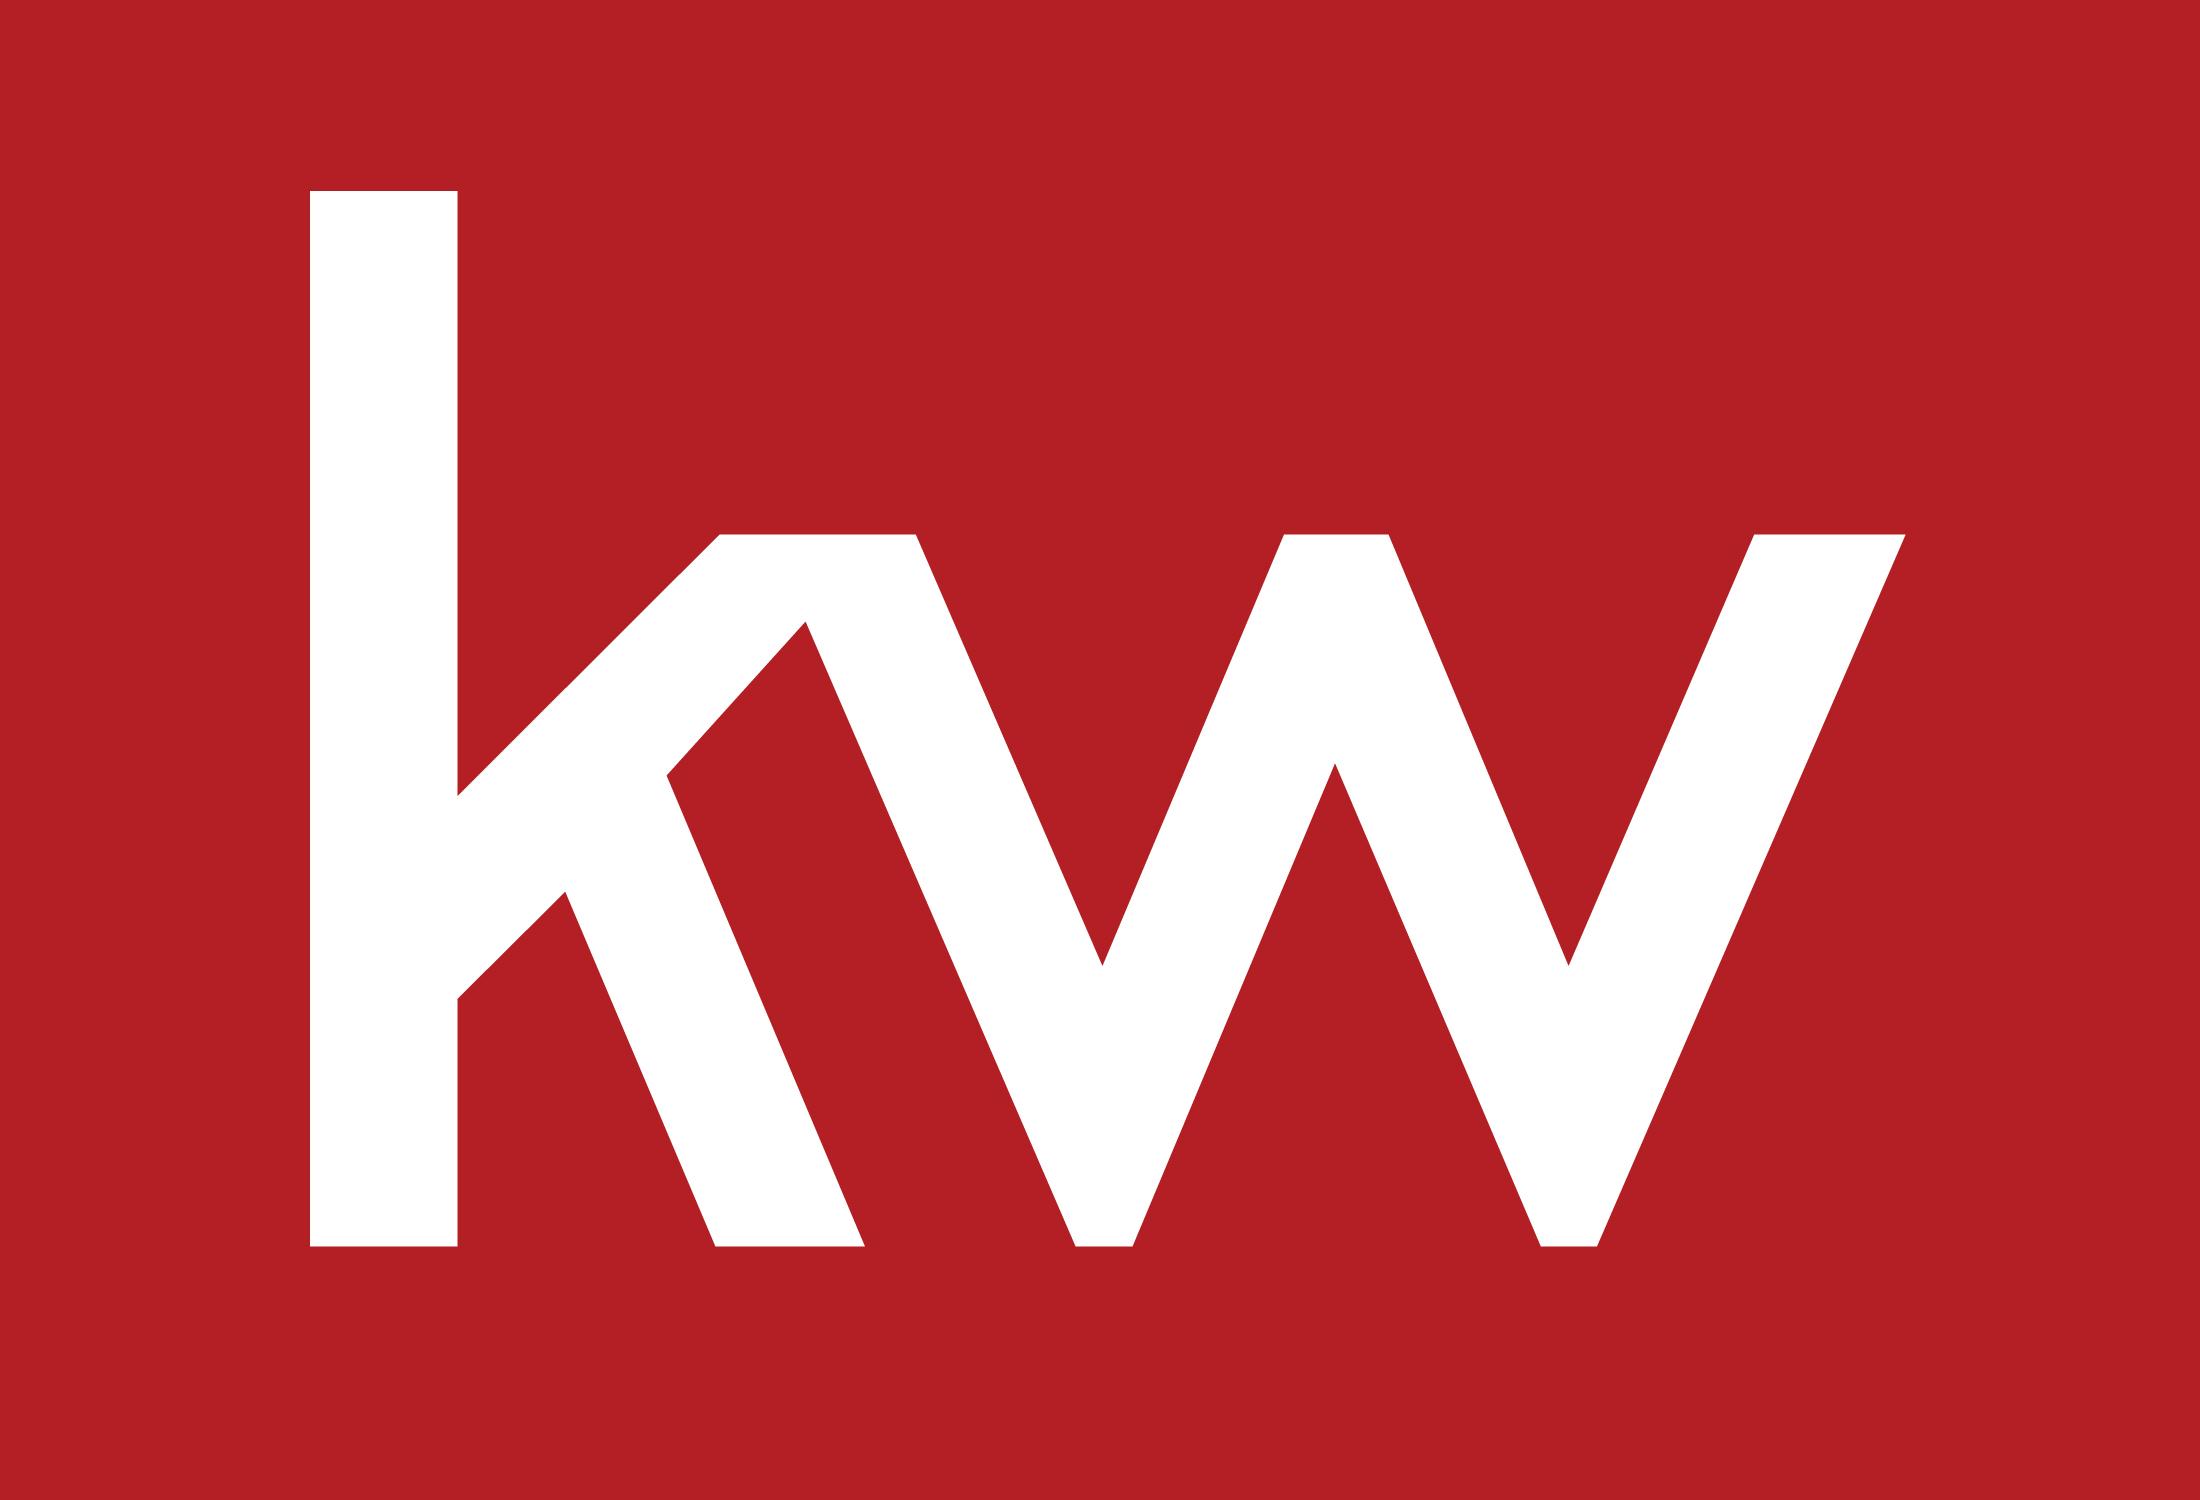 keller williams logo  keller williams symbol  meaning  history and evolution